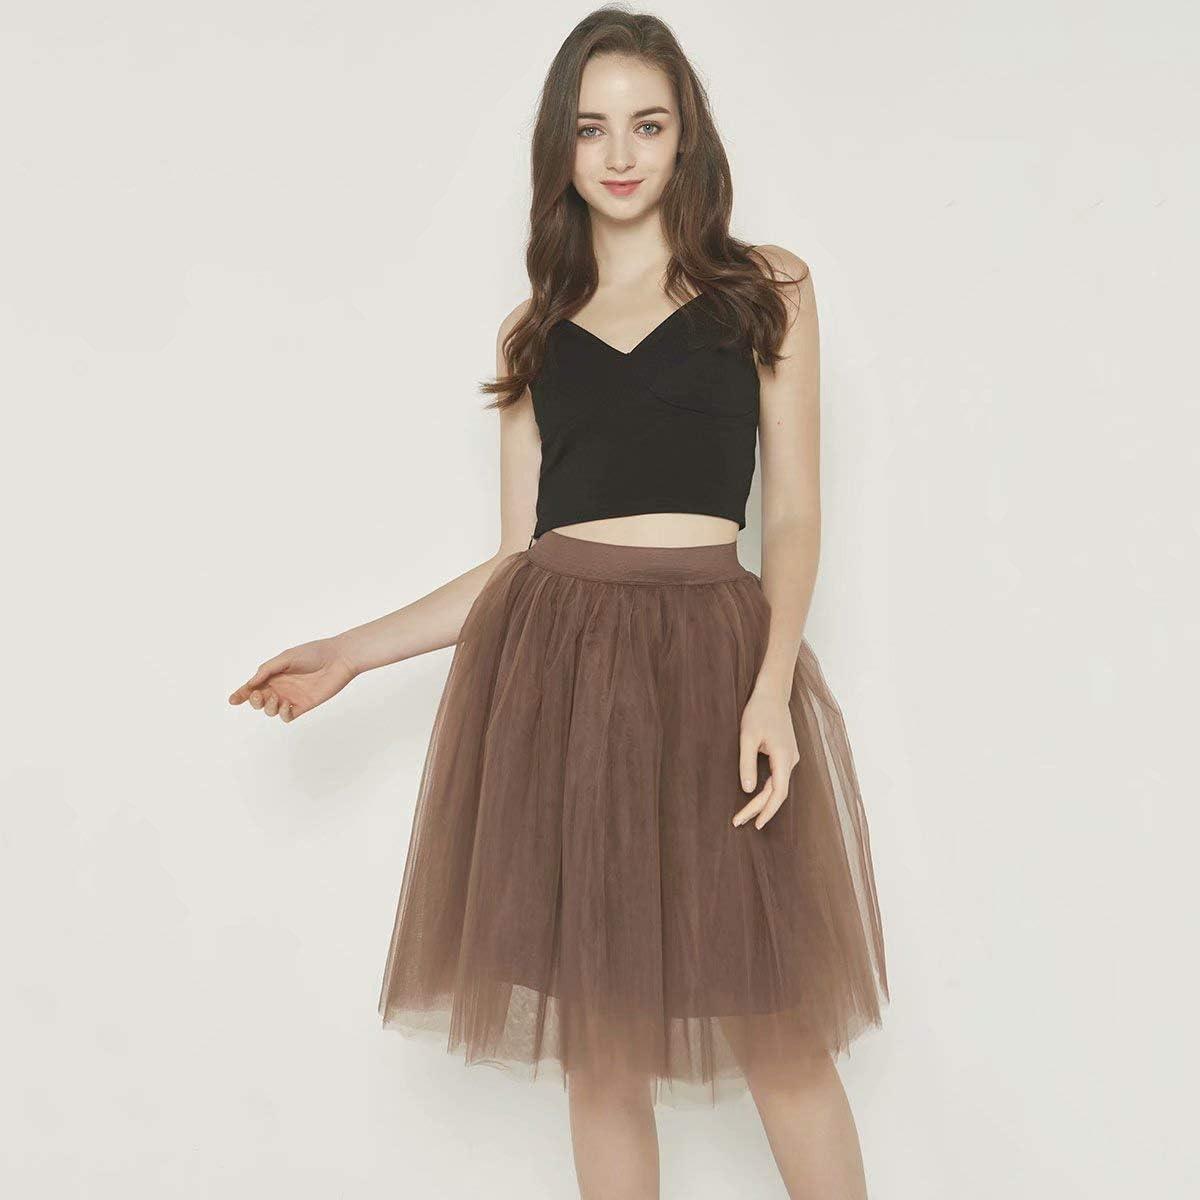 UZN Womens 50s Puffy Tulle Skirts Tutu Stretch Waist Half Slip 5 Layers Retro Party Skirt